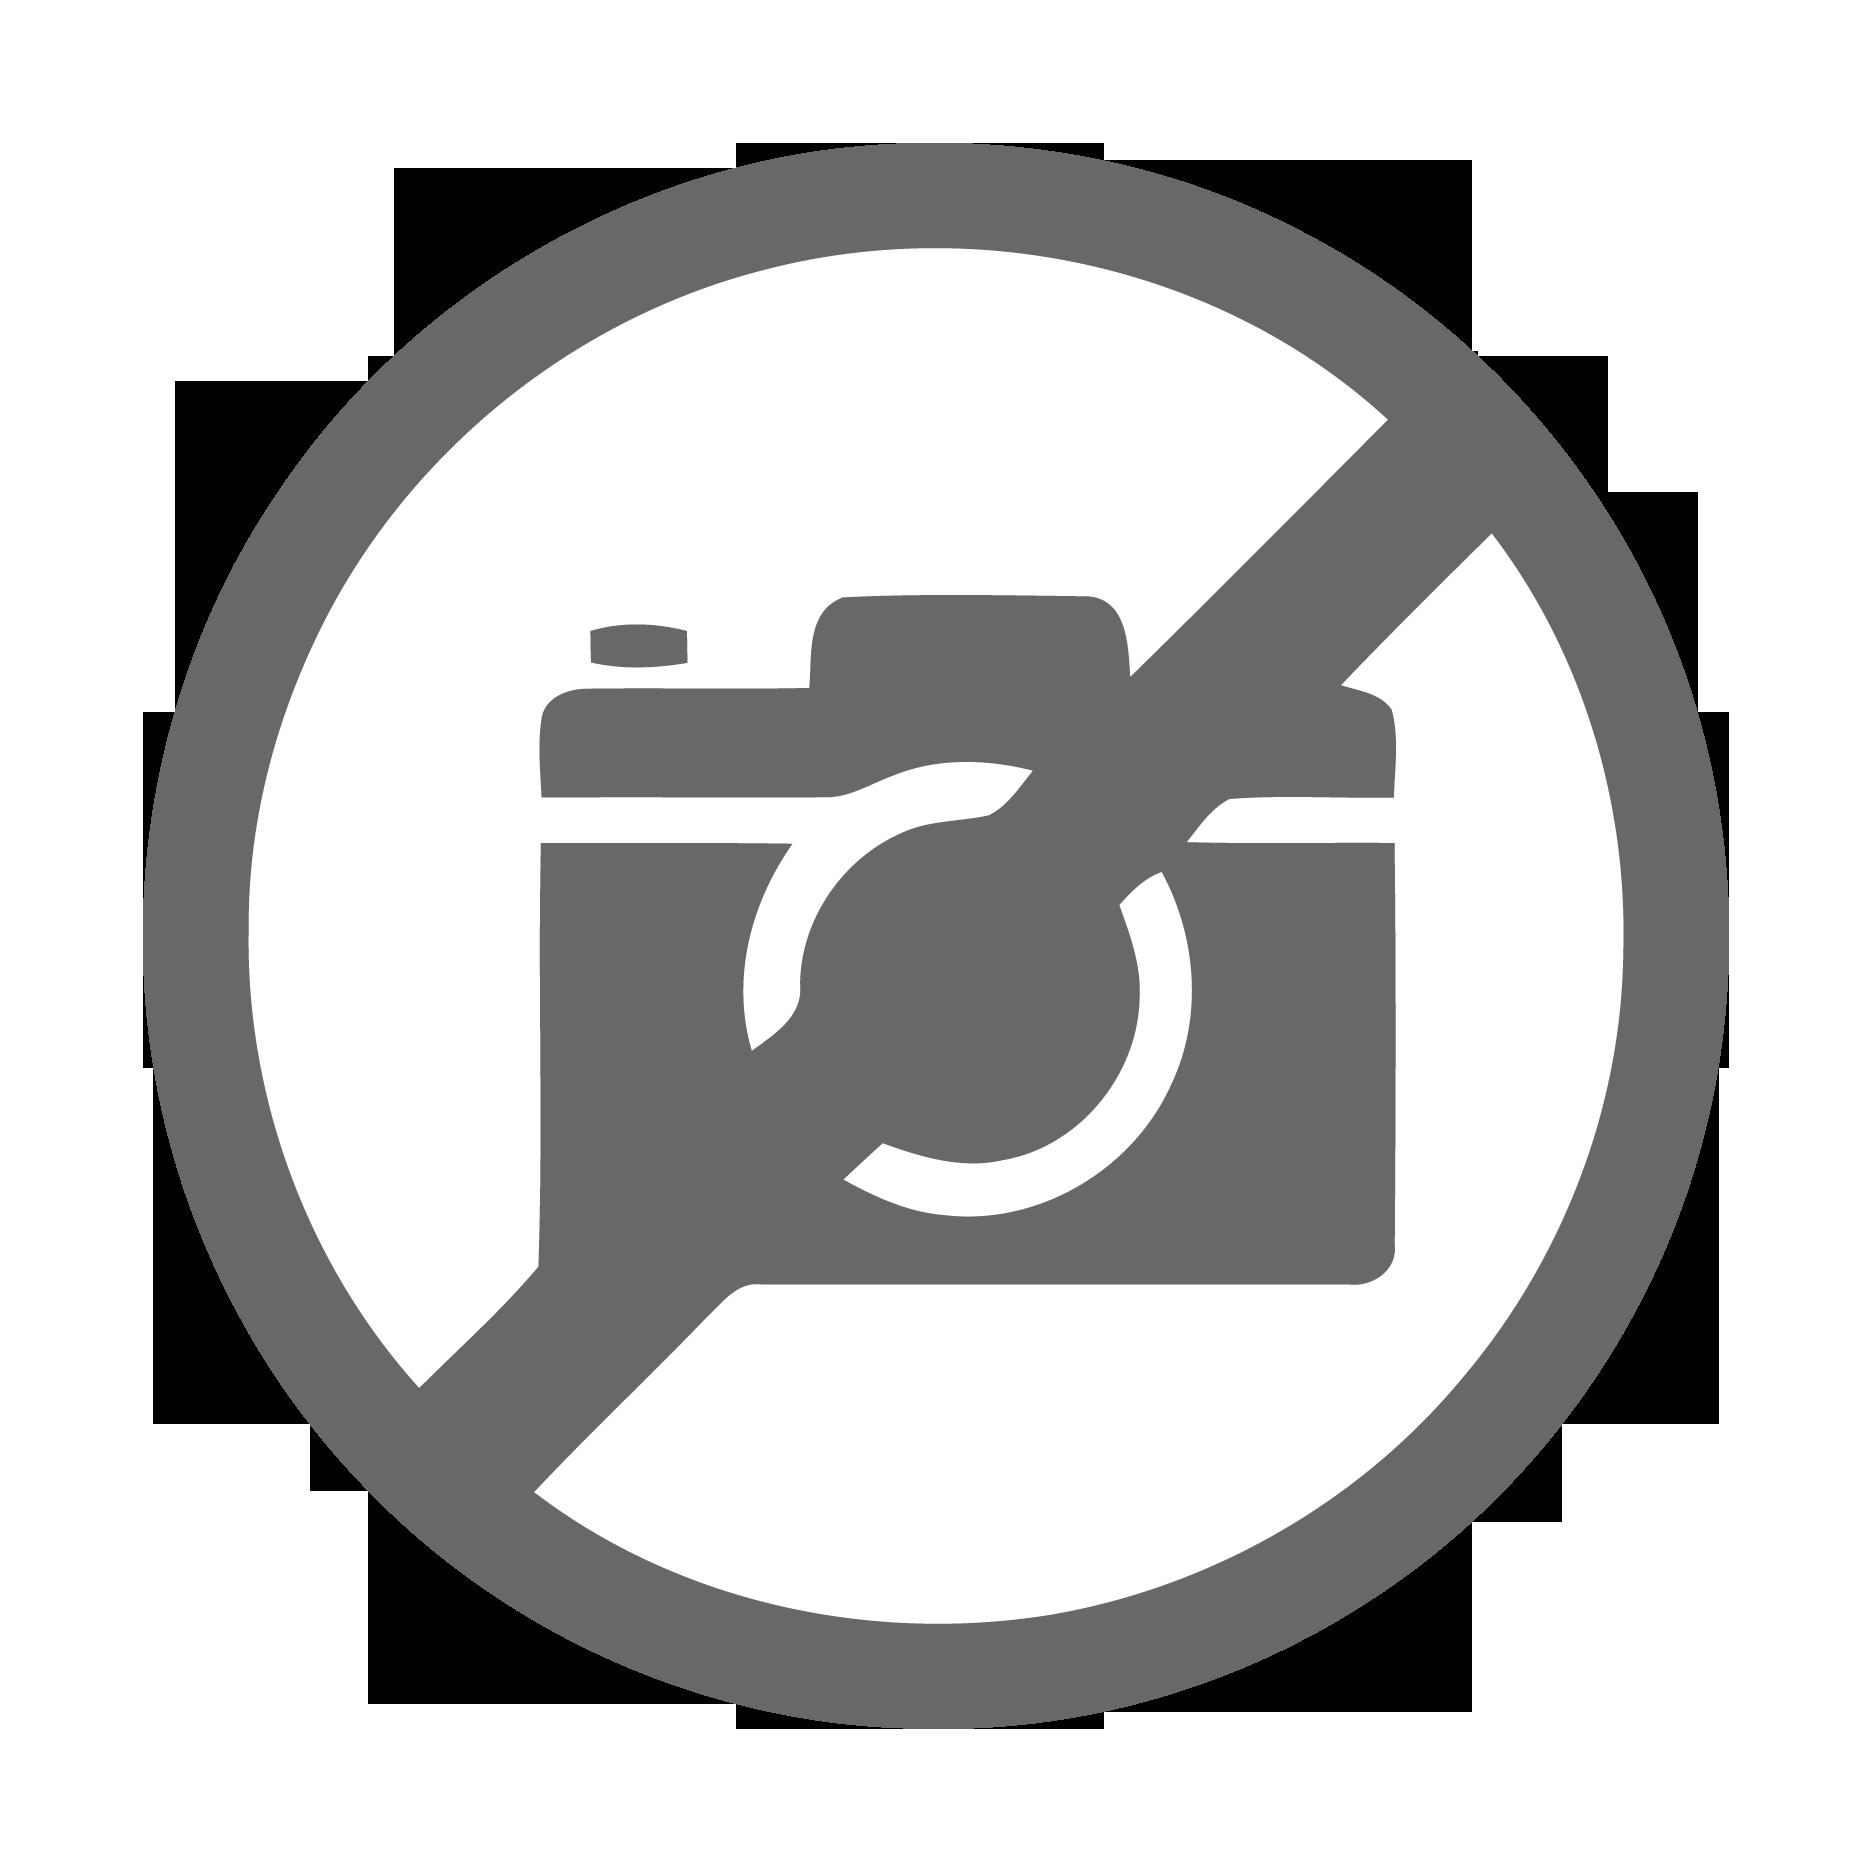 The Fist Burgers